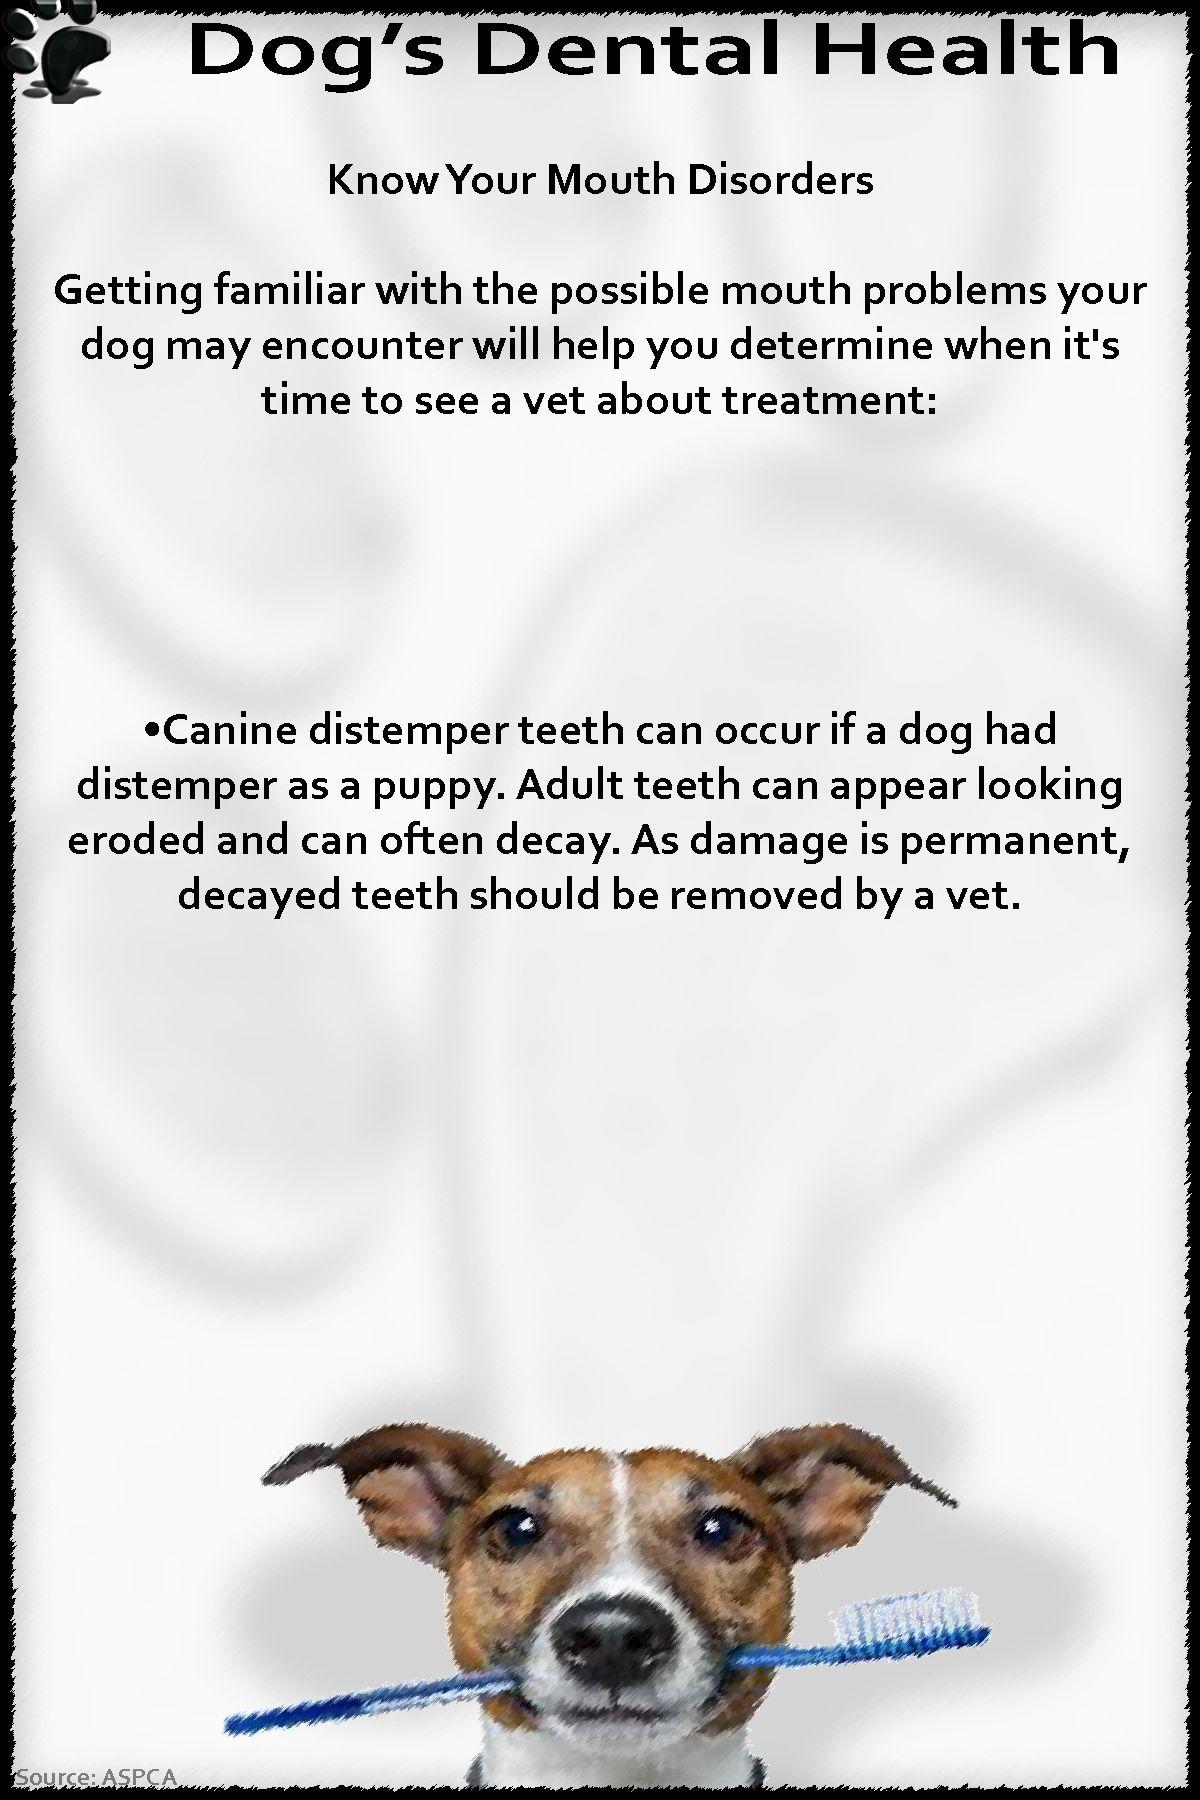 Dental health dog dental health dental health dental